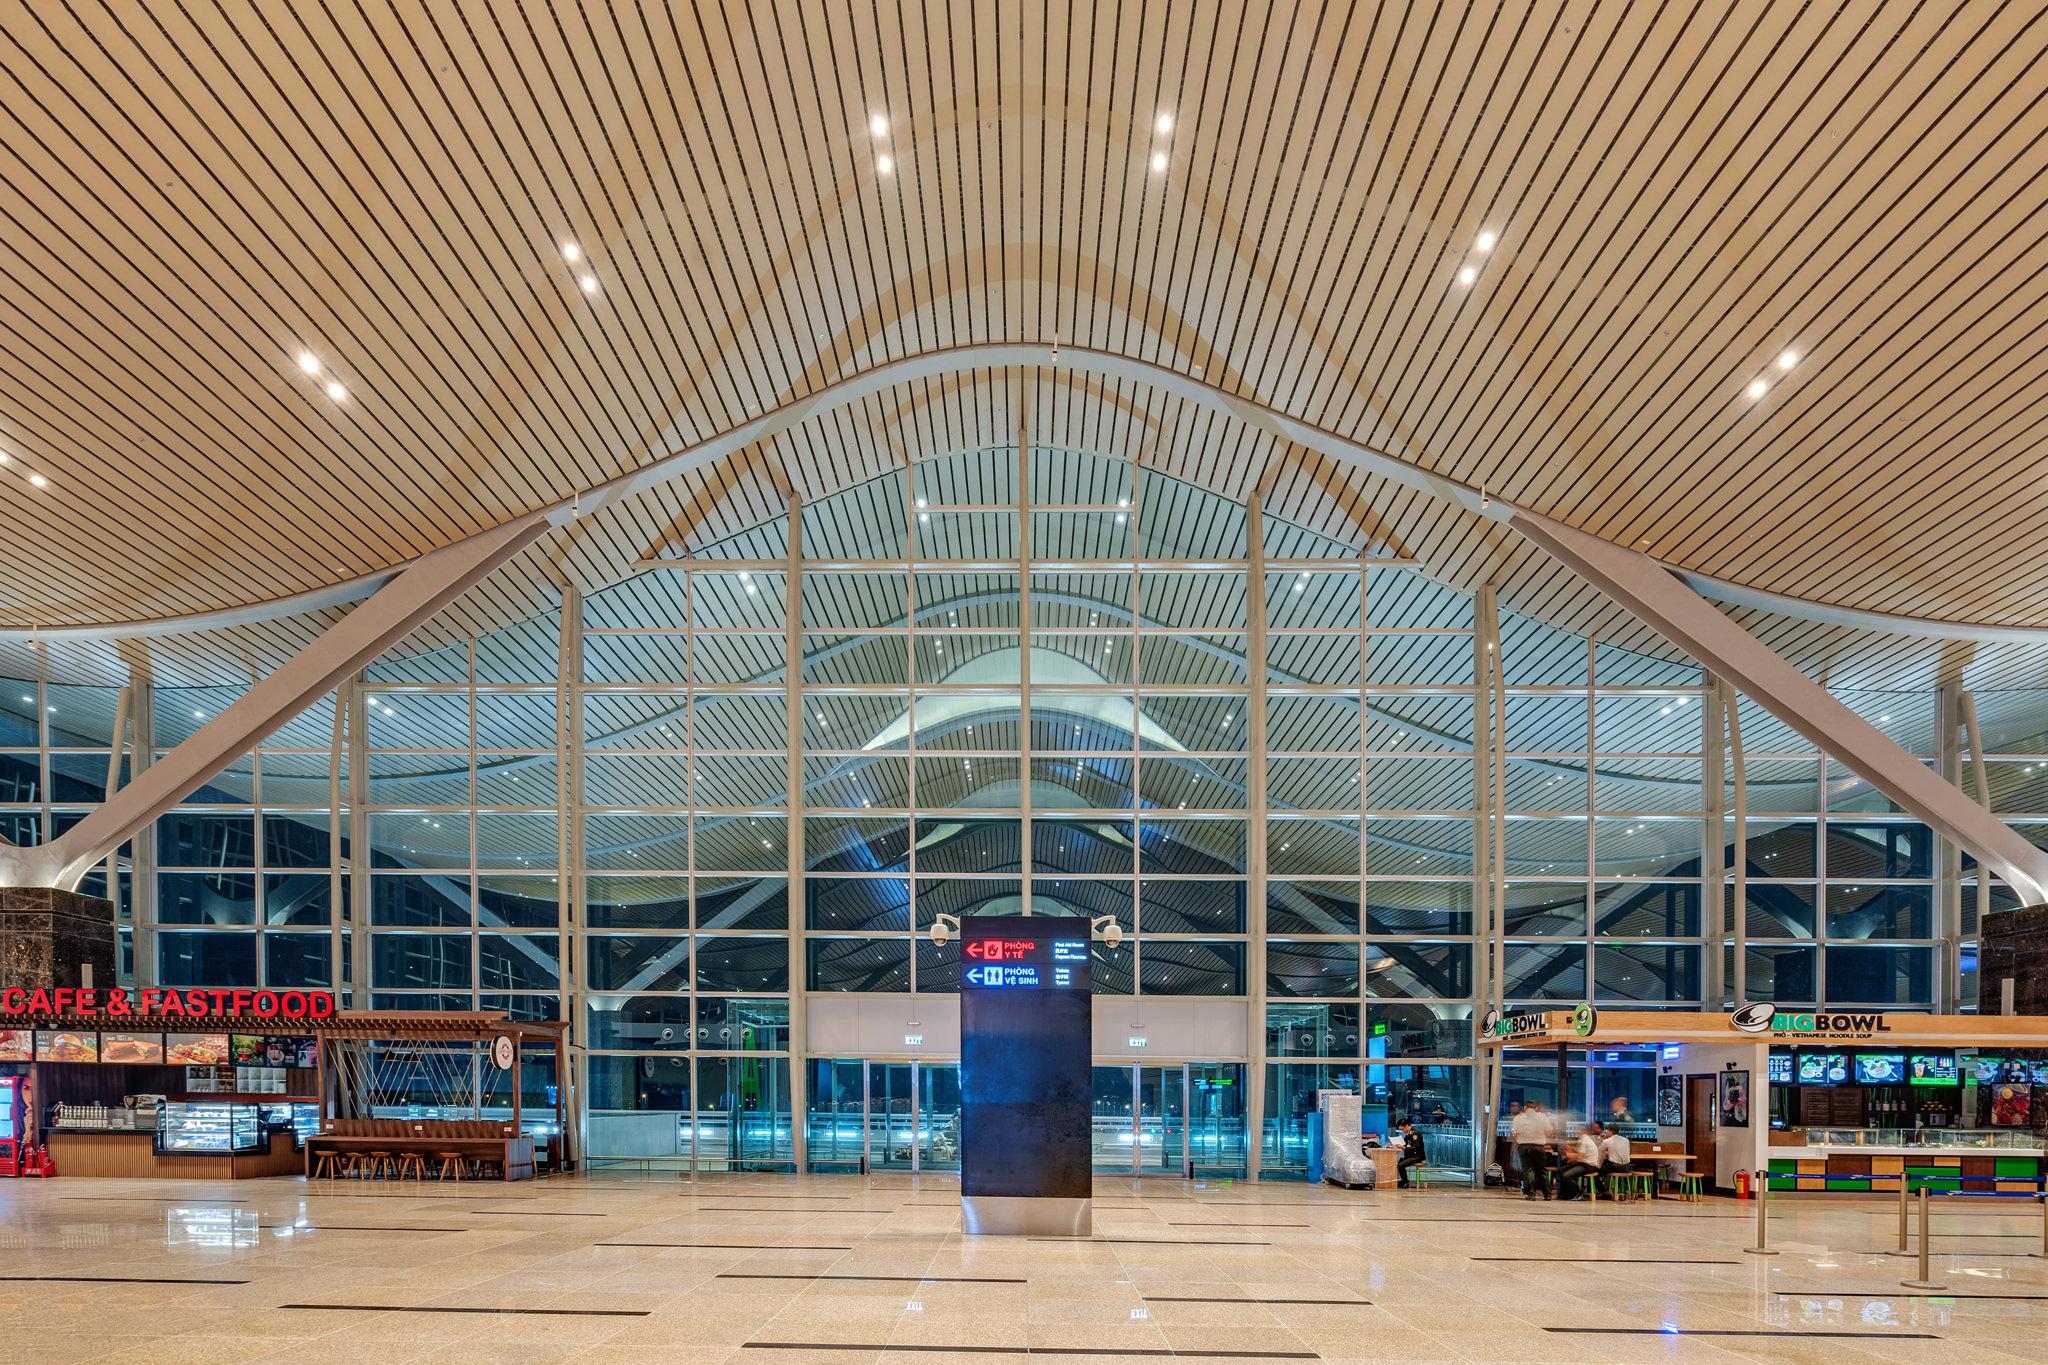 20180626 - Cam Ranh Airport - Architecture - 0440.jpg